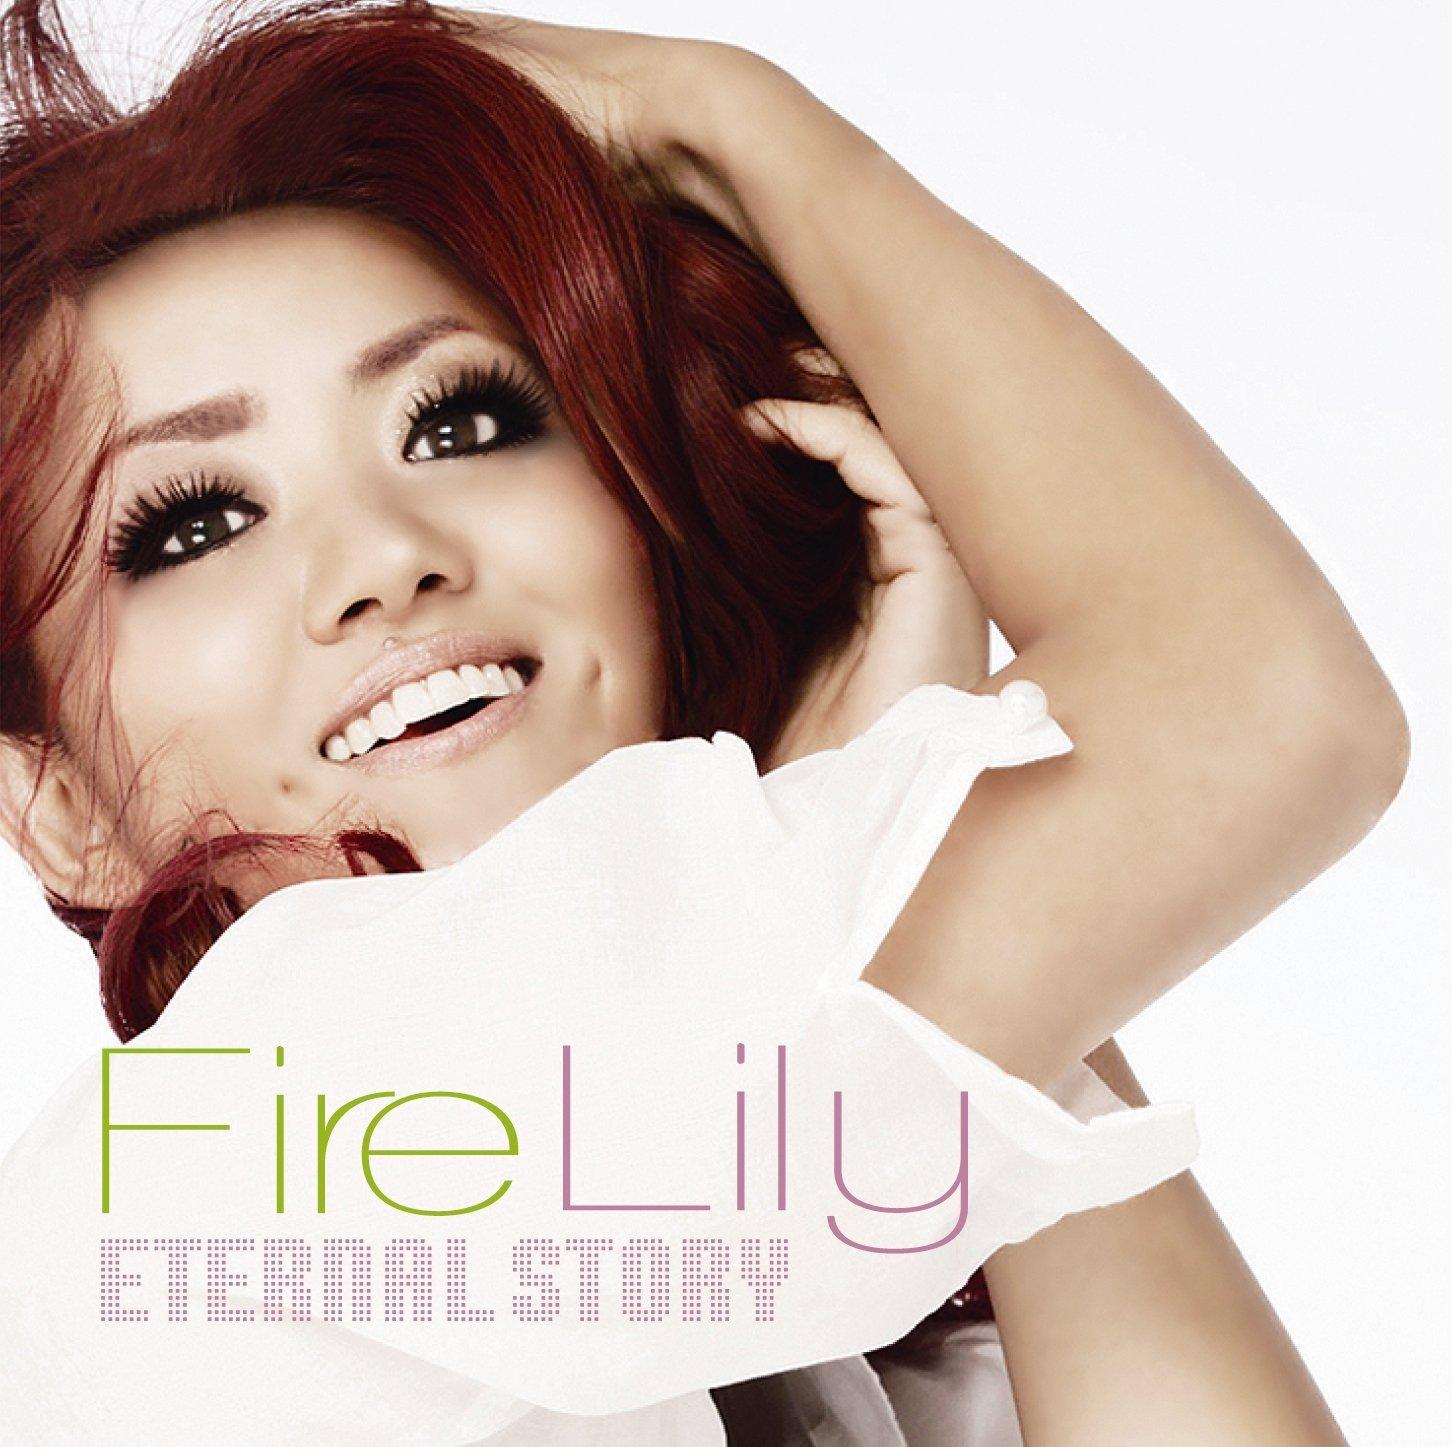 Fire Lily (MARU)